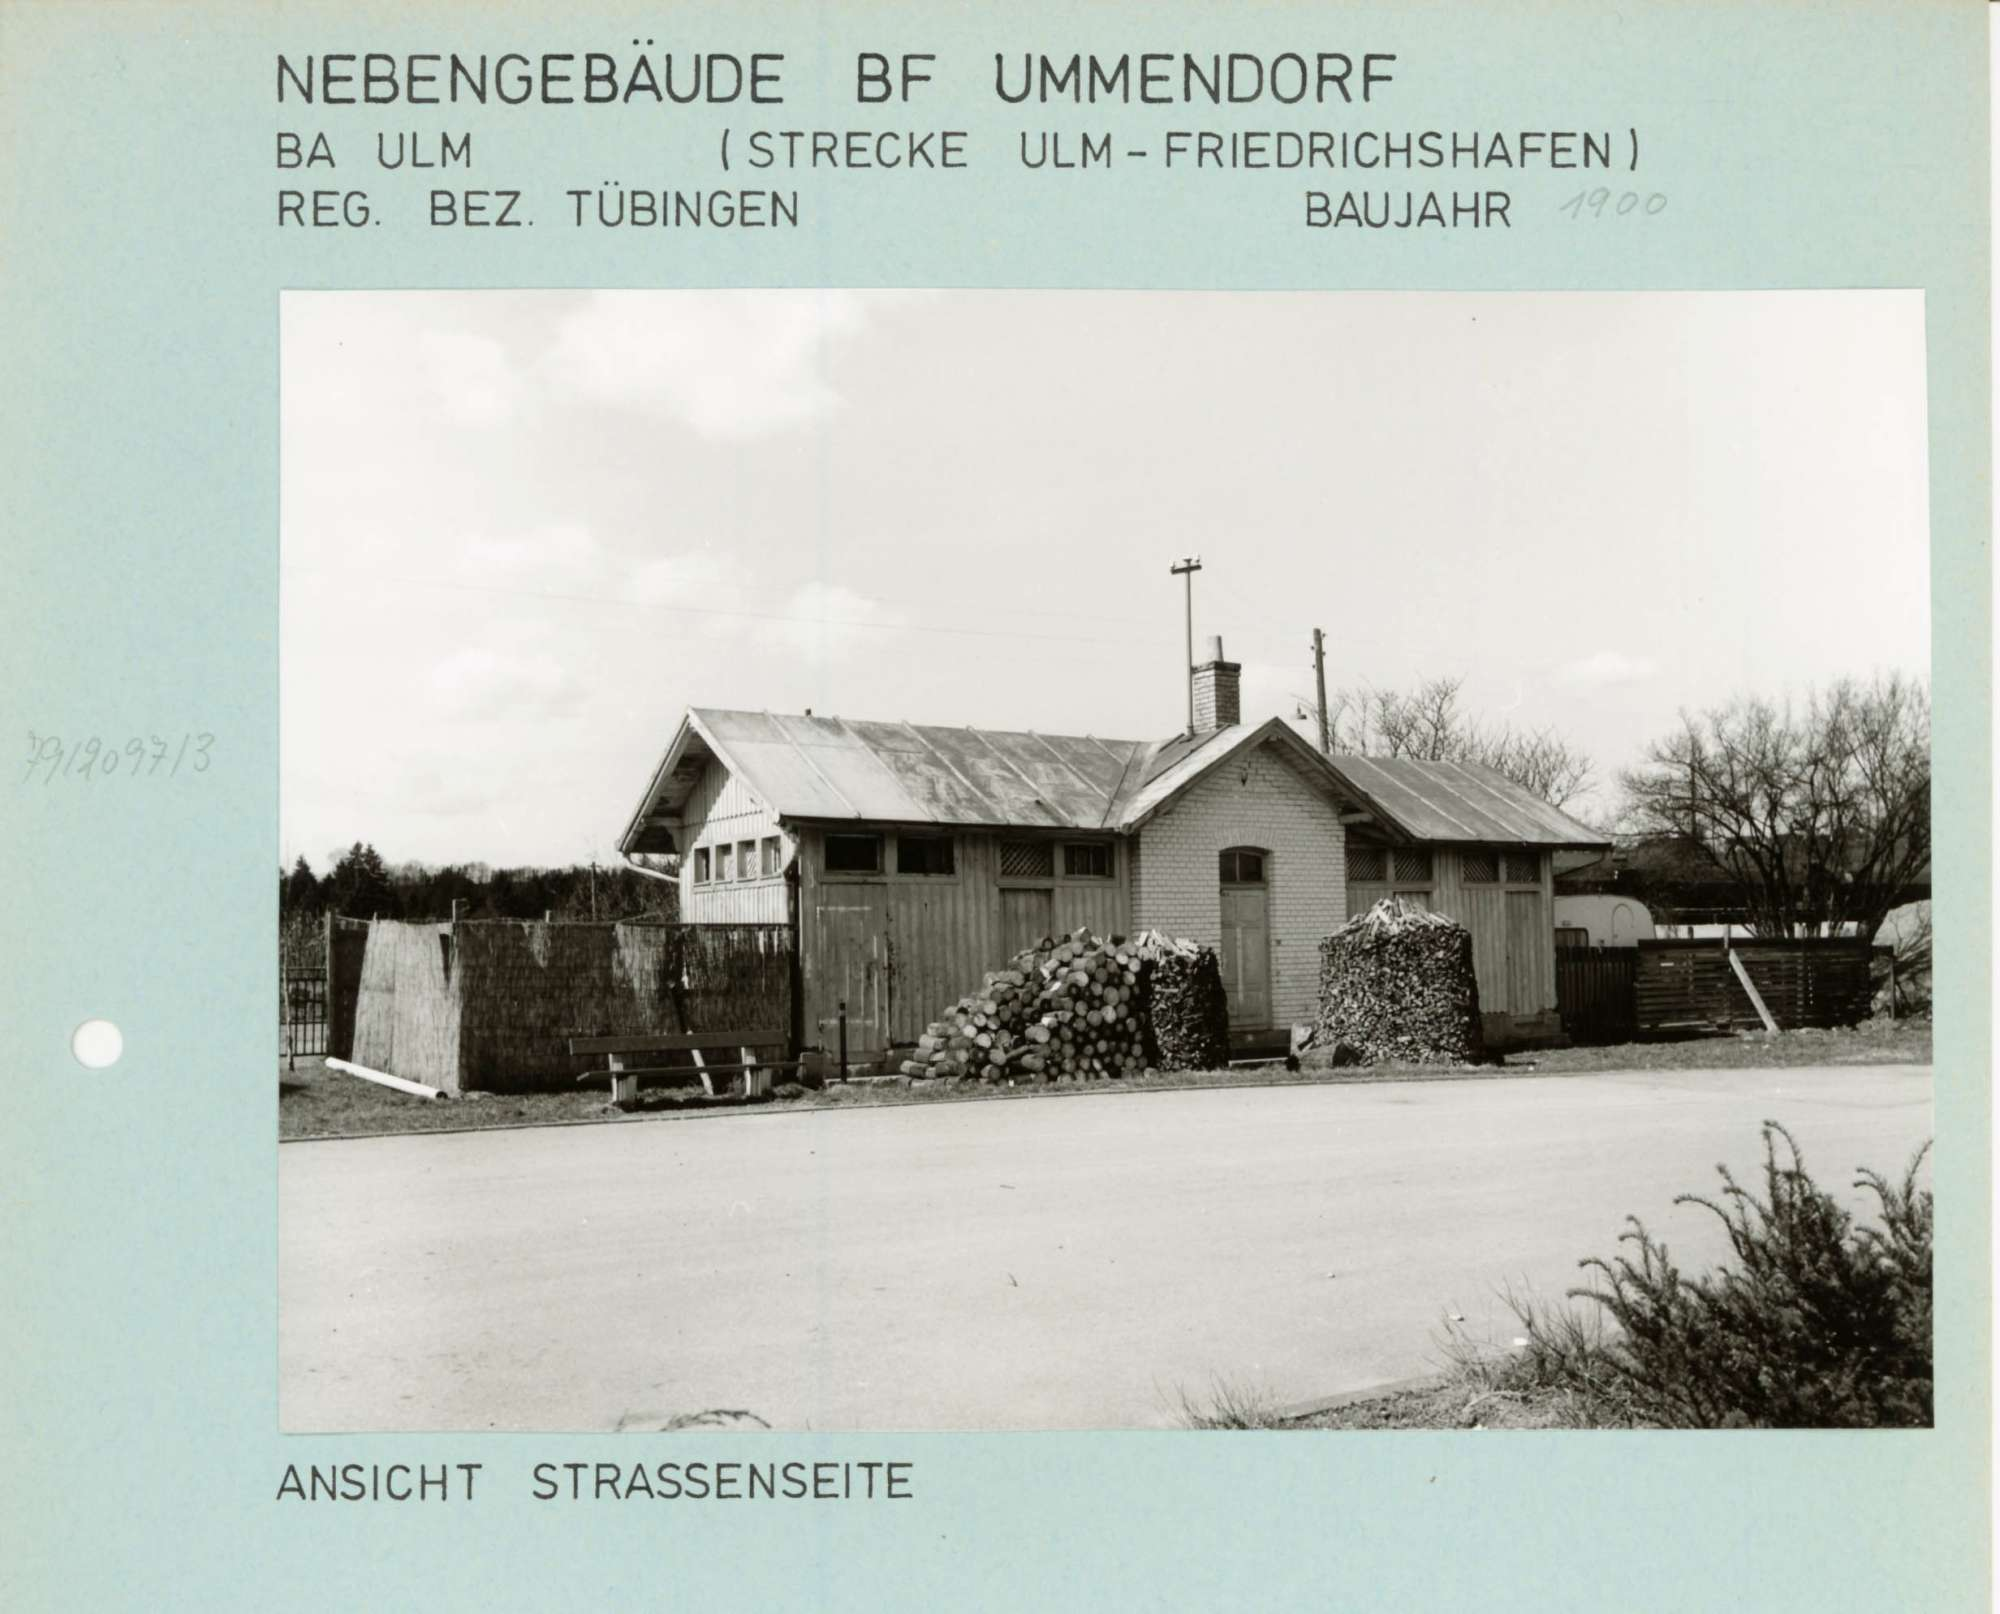 Ummendorf: 6 Fotos, Bild 2